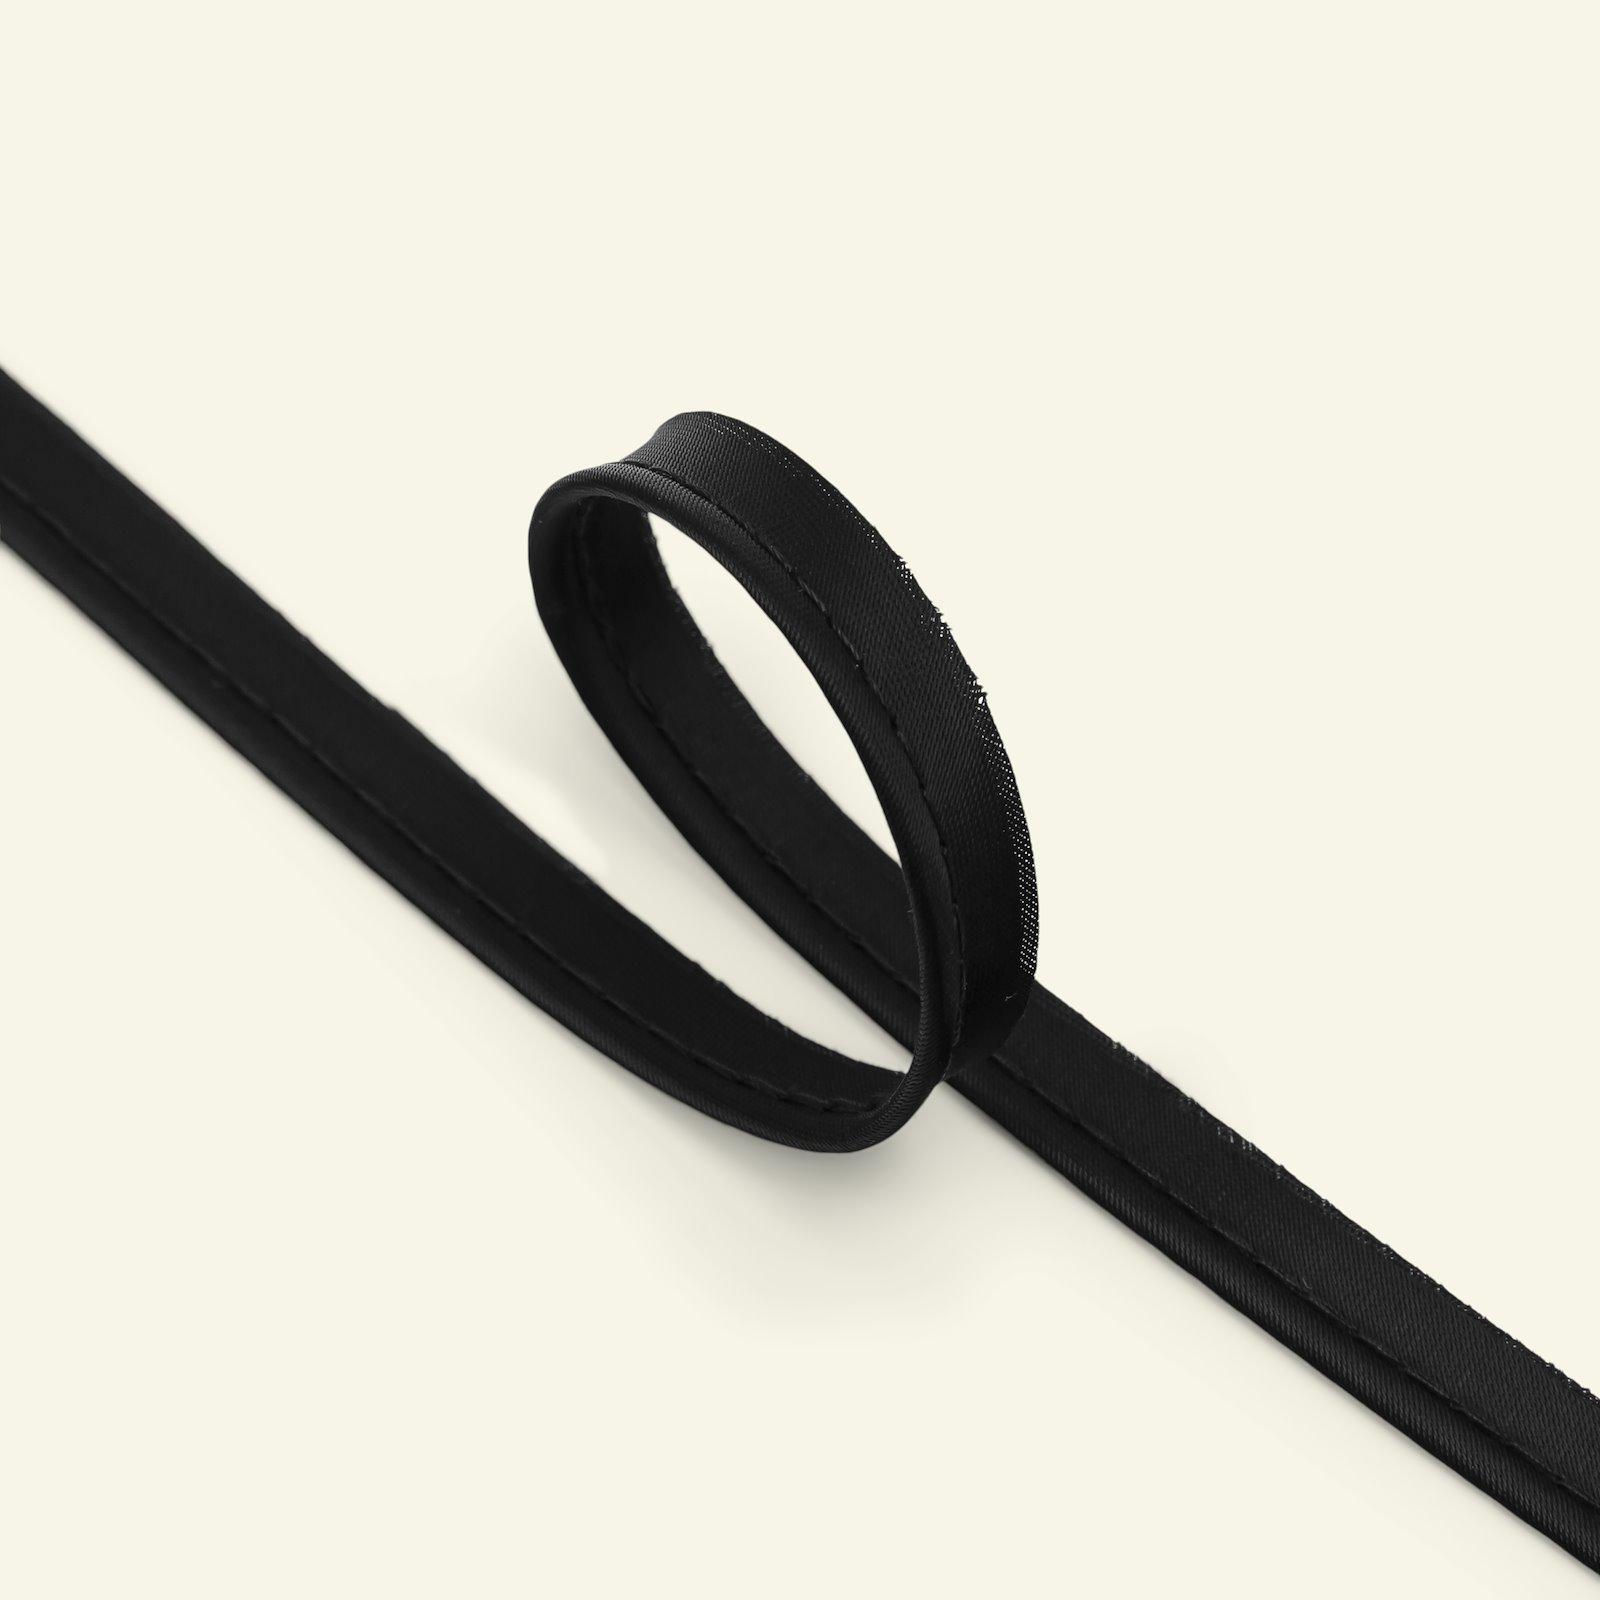 Piping ribbon satin 4mm black 5m 72043_pack